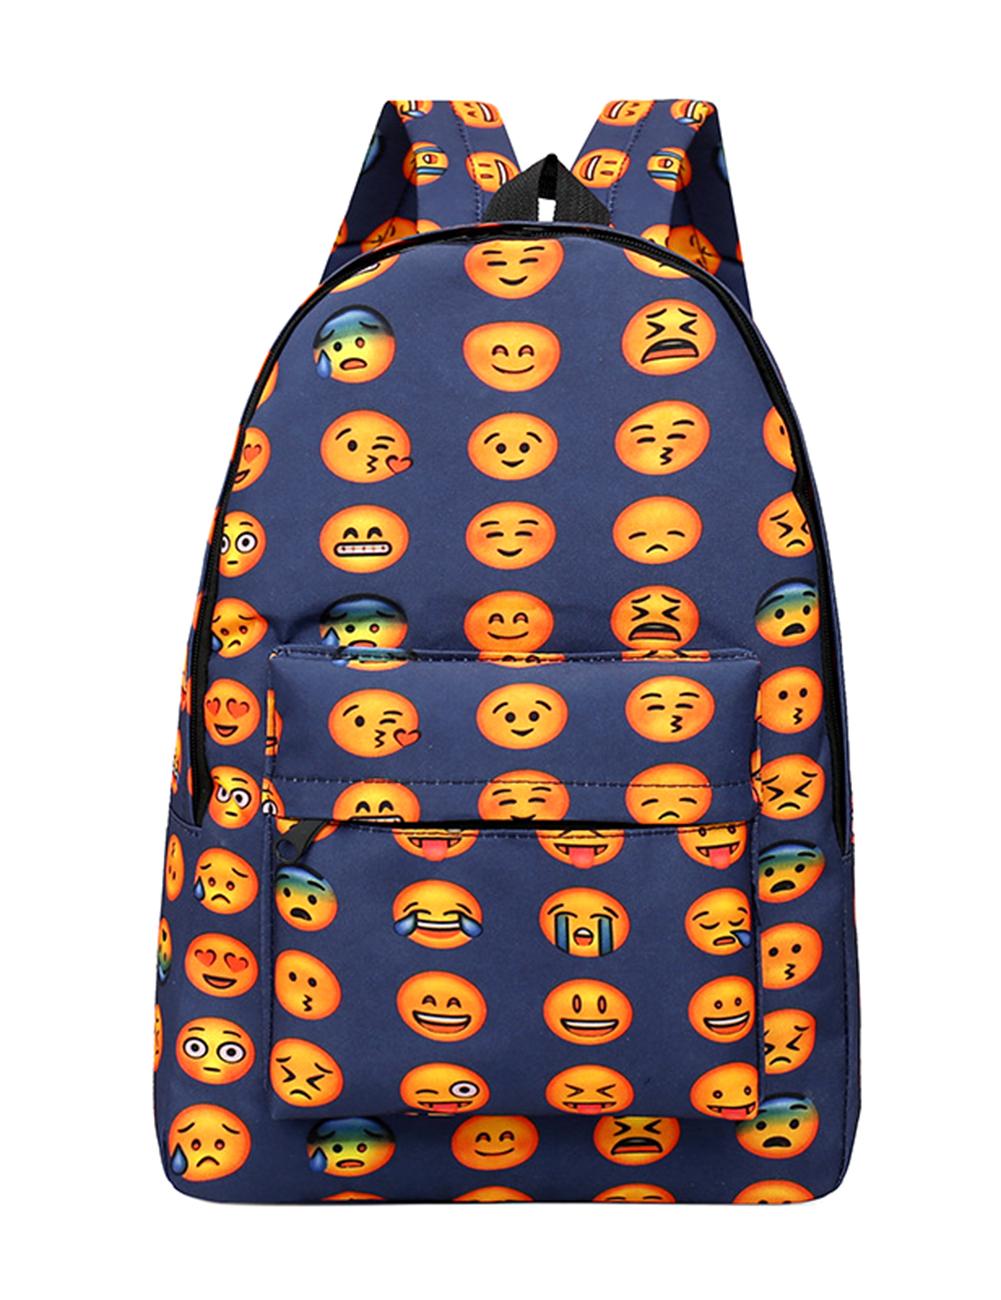 [EU Direct] Unisex Students' Big Capacity Backpack Oxford Cloth Cute Expression Shoulder Bag Dark blue